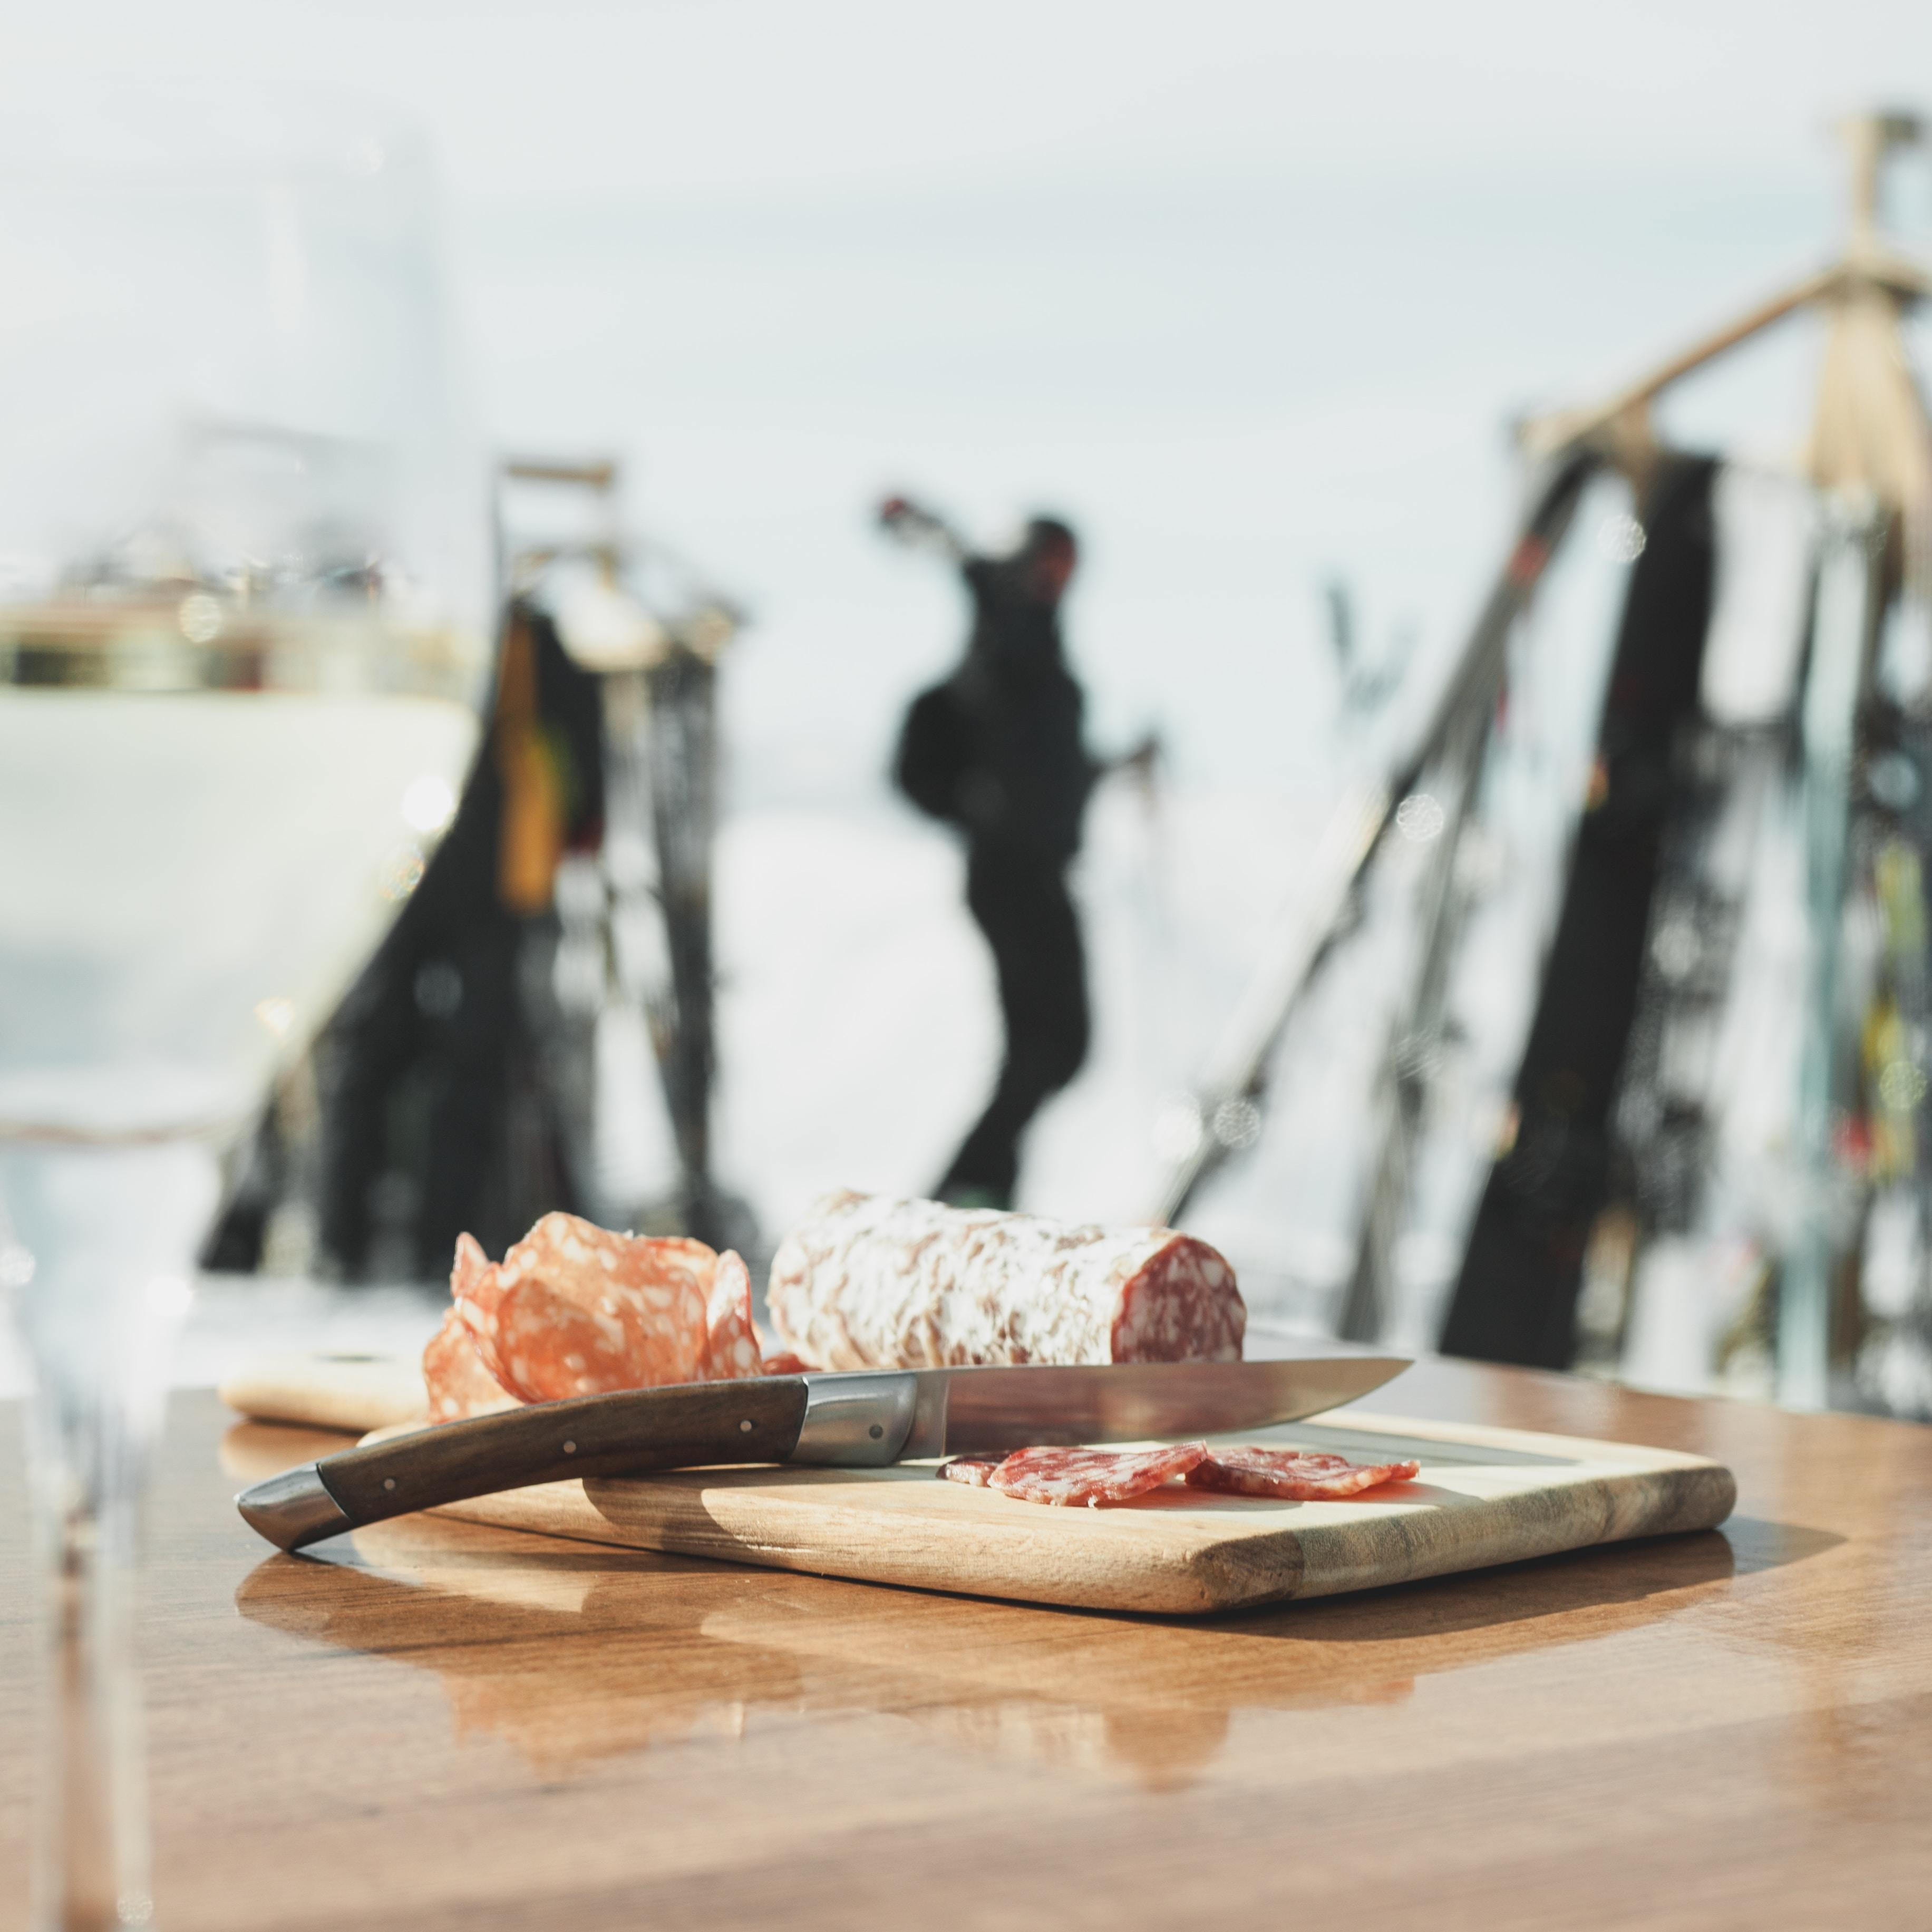 salami sausage on top of cutting board